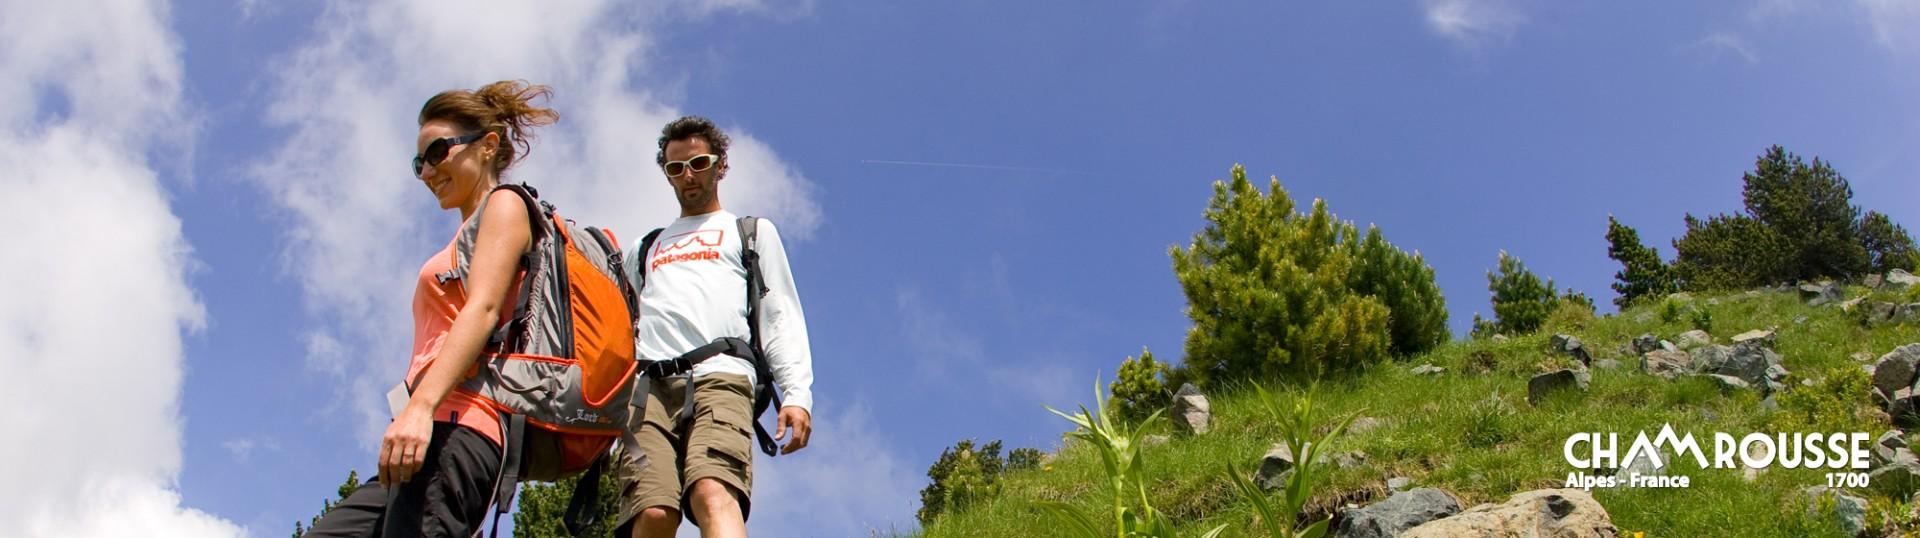 Sommer Aktivitäten in Chamrousse